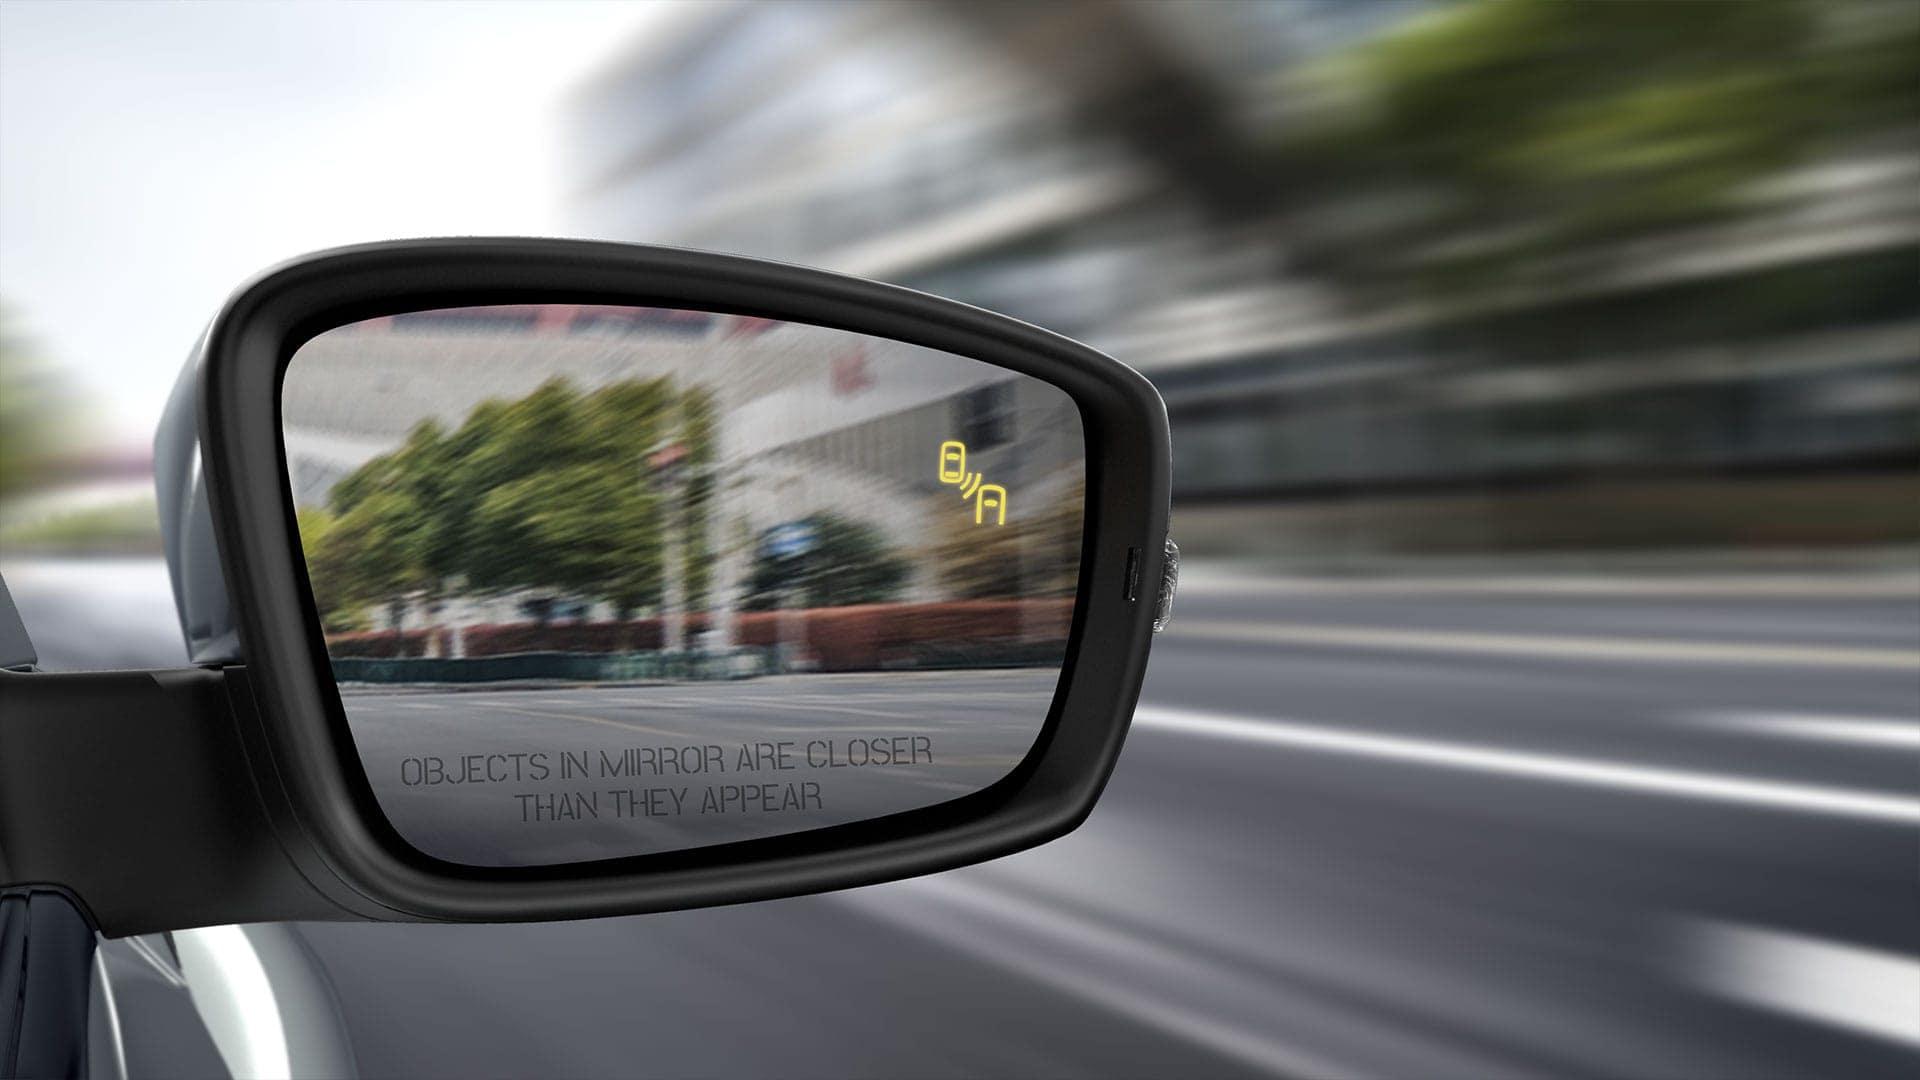 2019 VW Beetle blind spot detection